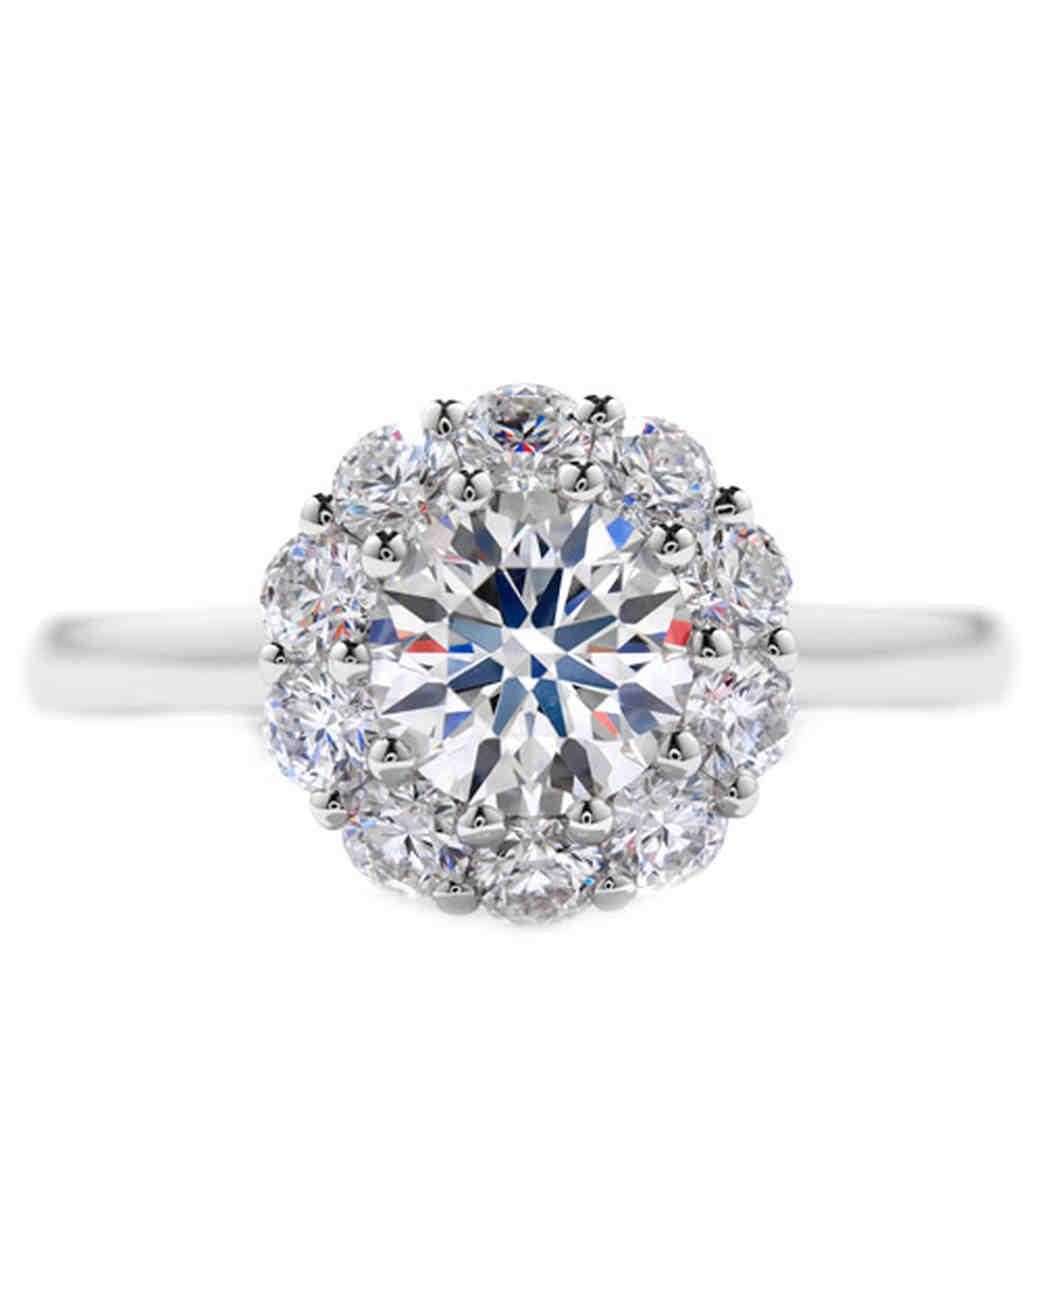 Round unique diamond engagement rings new photo